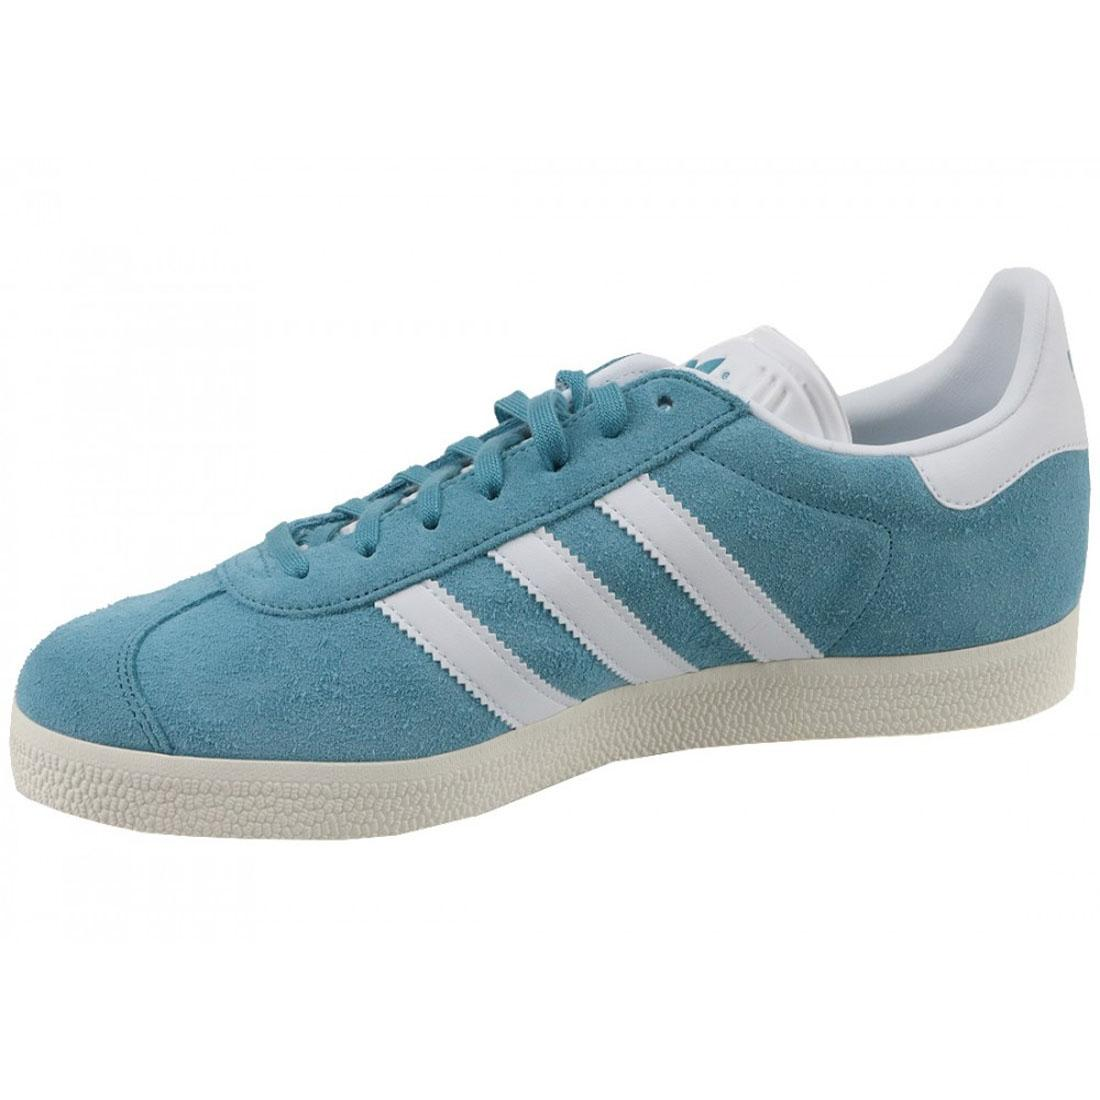 new product 89284 5859f adidas originals Gazelle Trainers Blue White Mens Shoes BZ0022